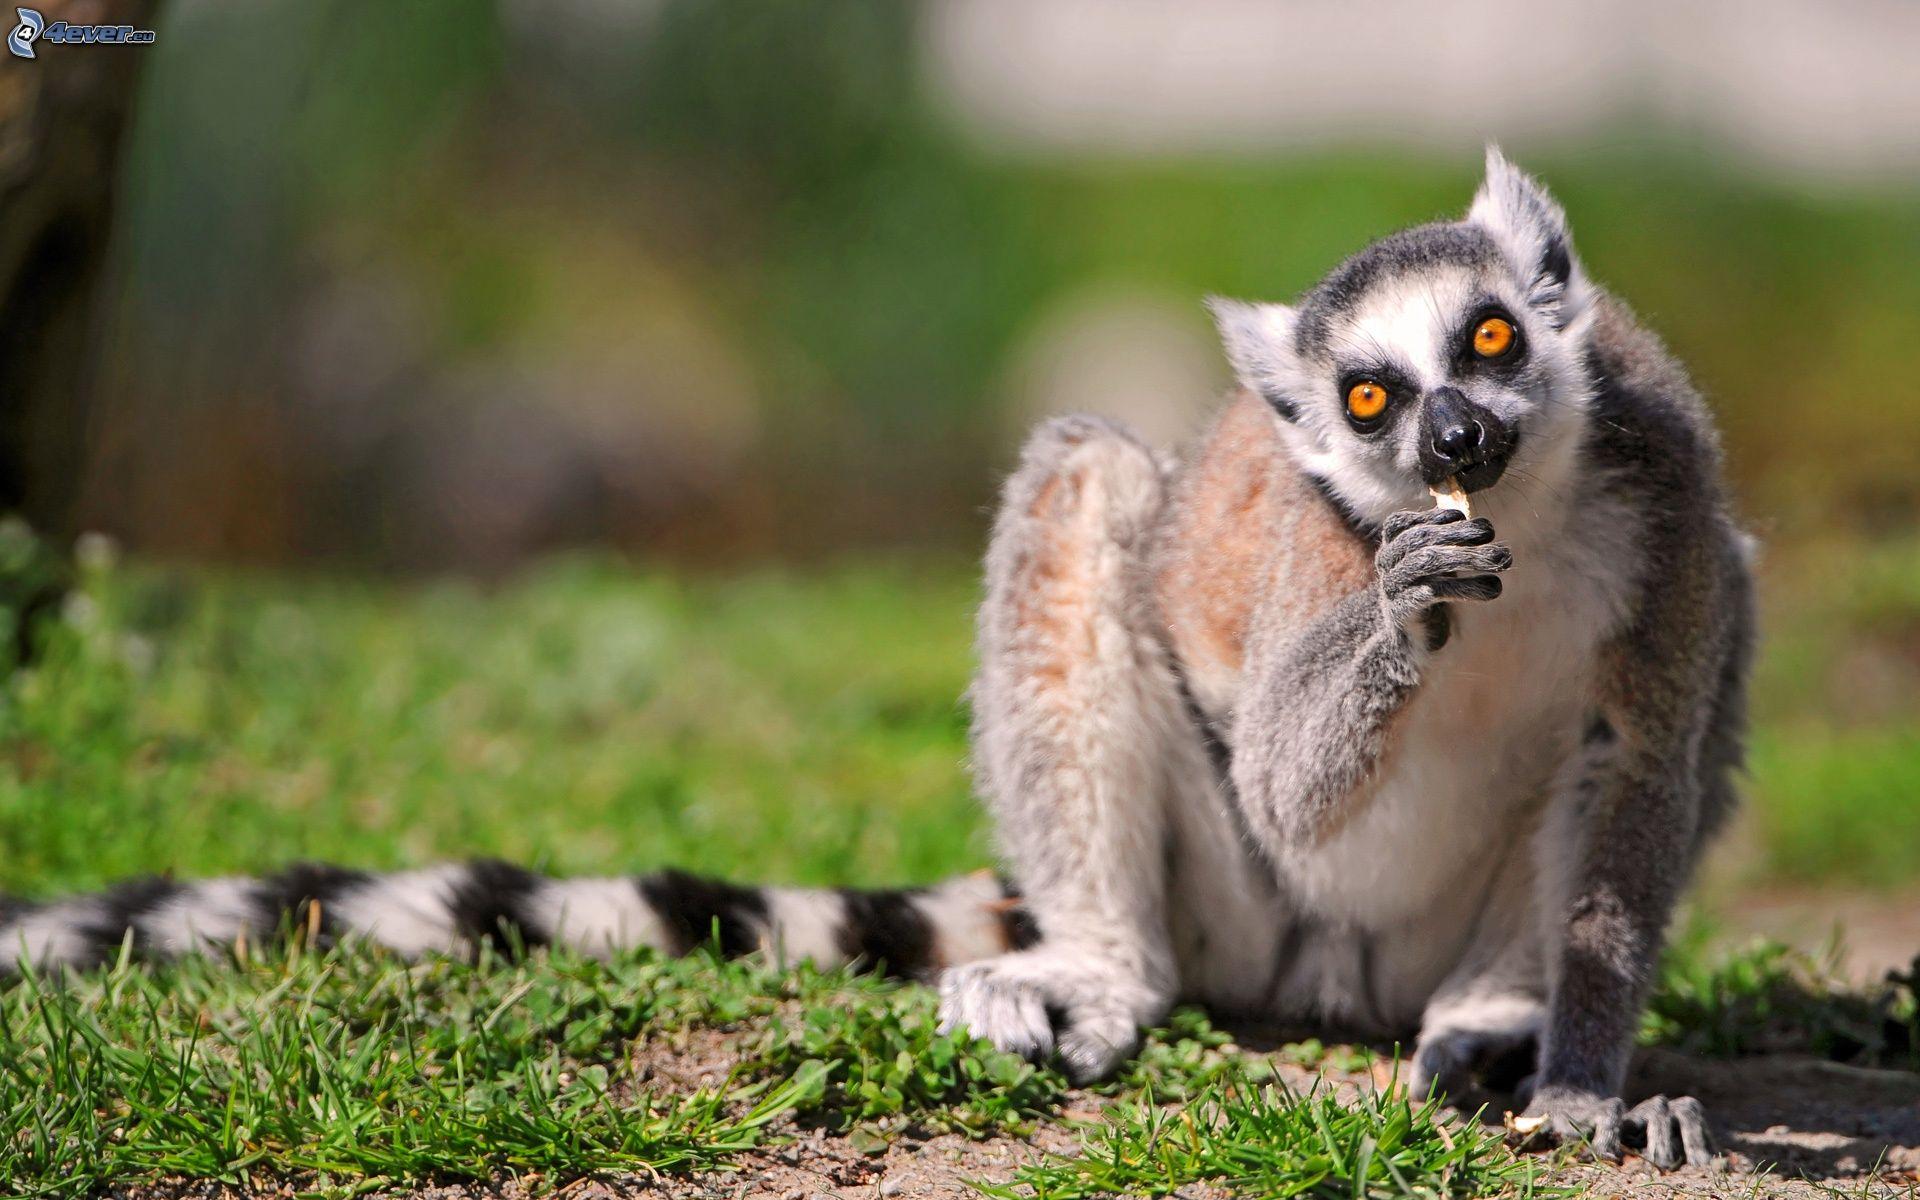 download wallpaper 3840x2160 lemur-#11